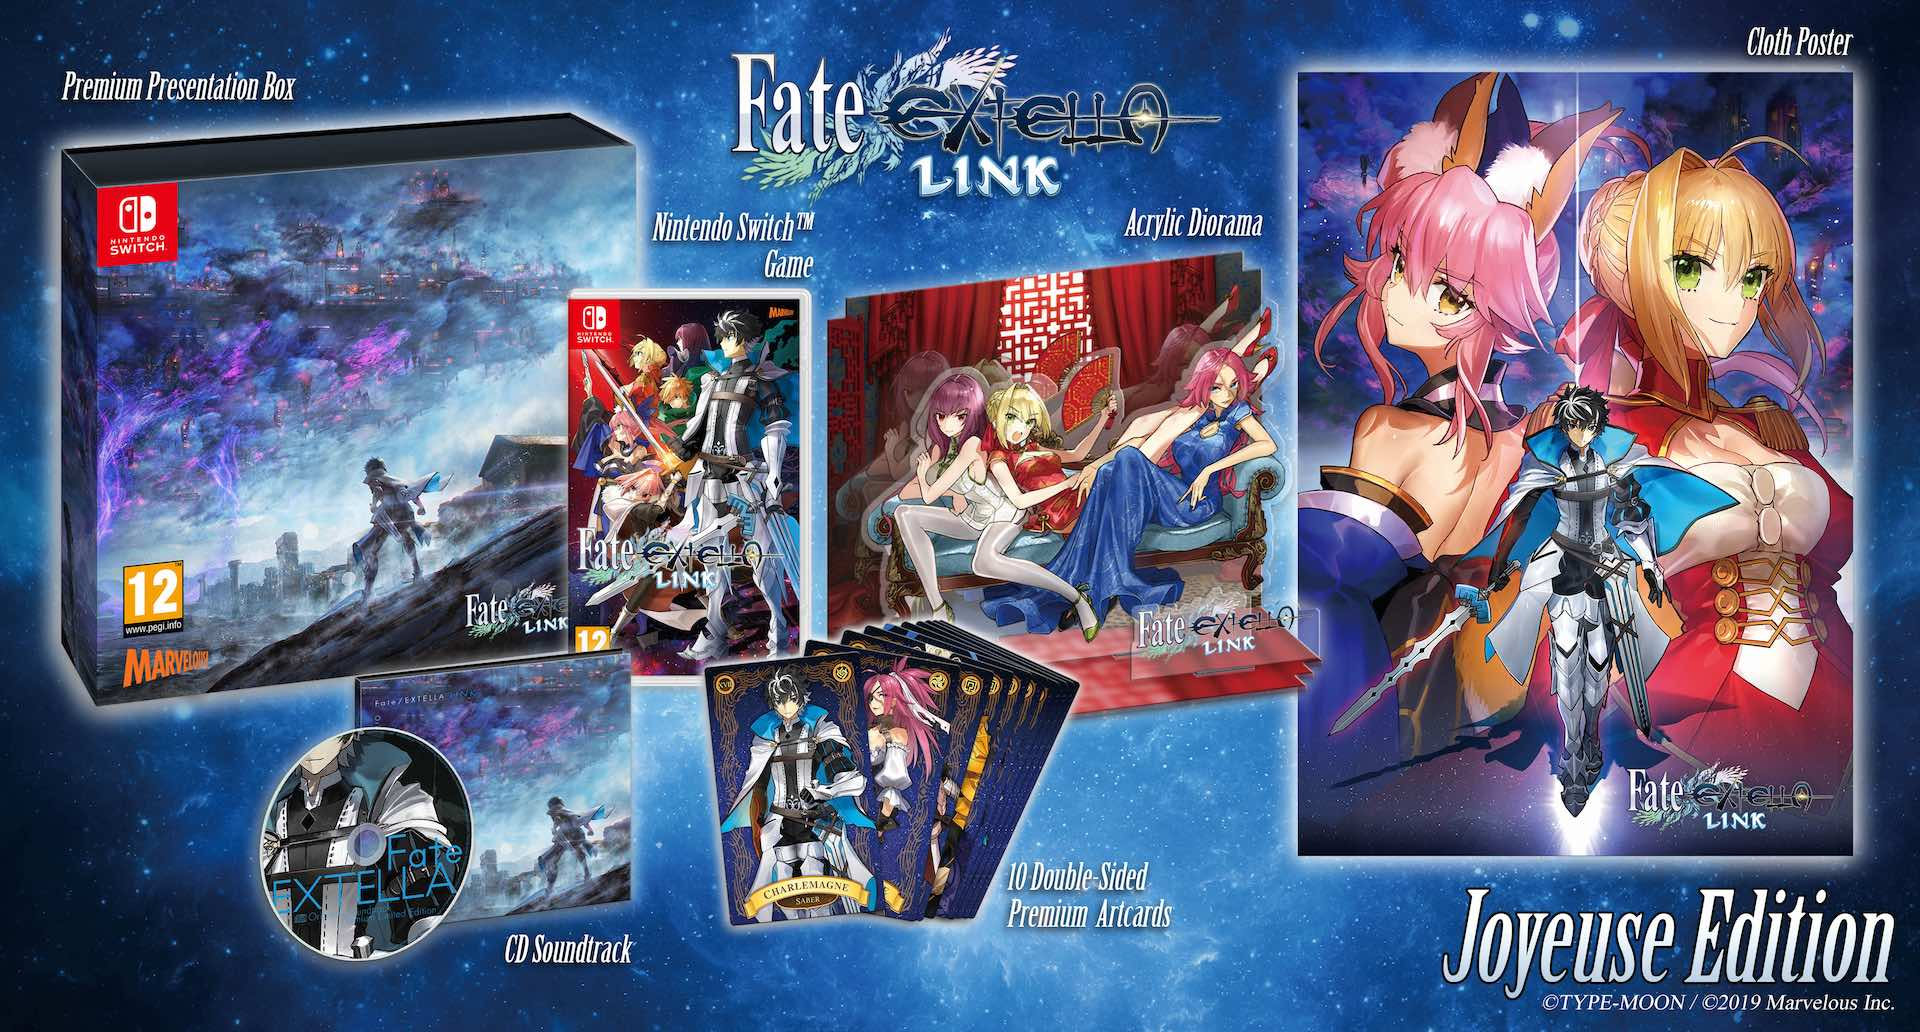 Fate/EXTELLA LINK Joyeuse Edition Photo